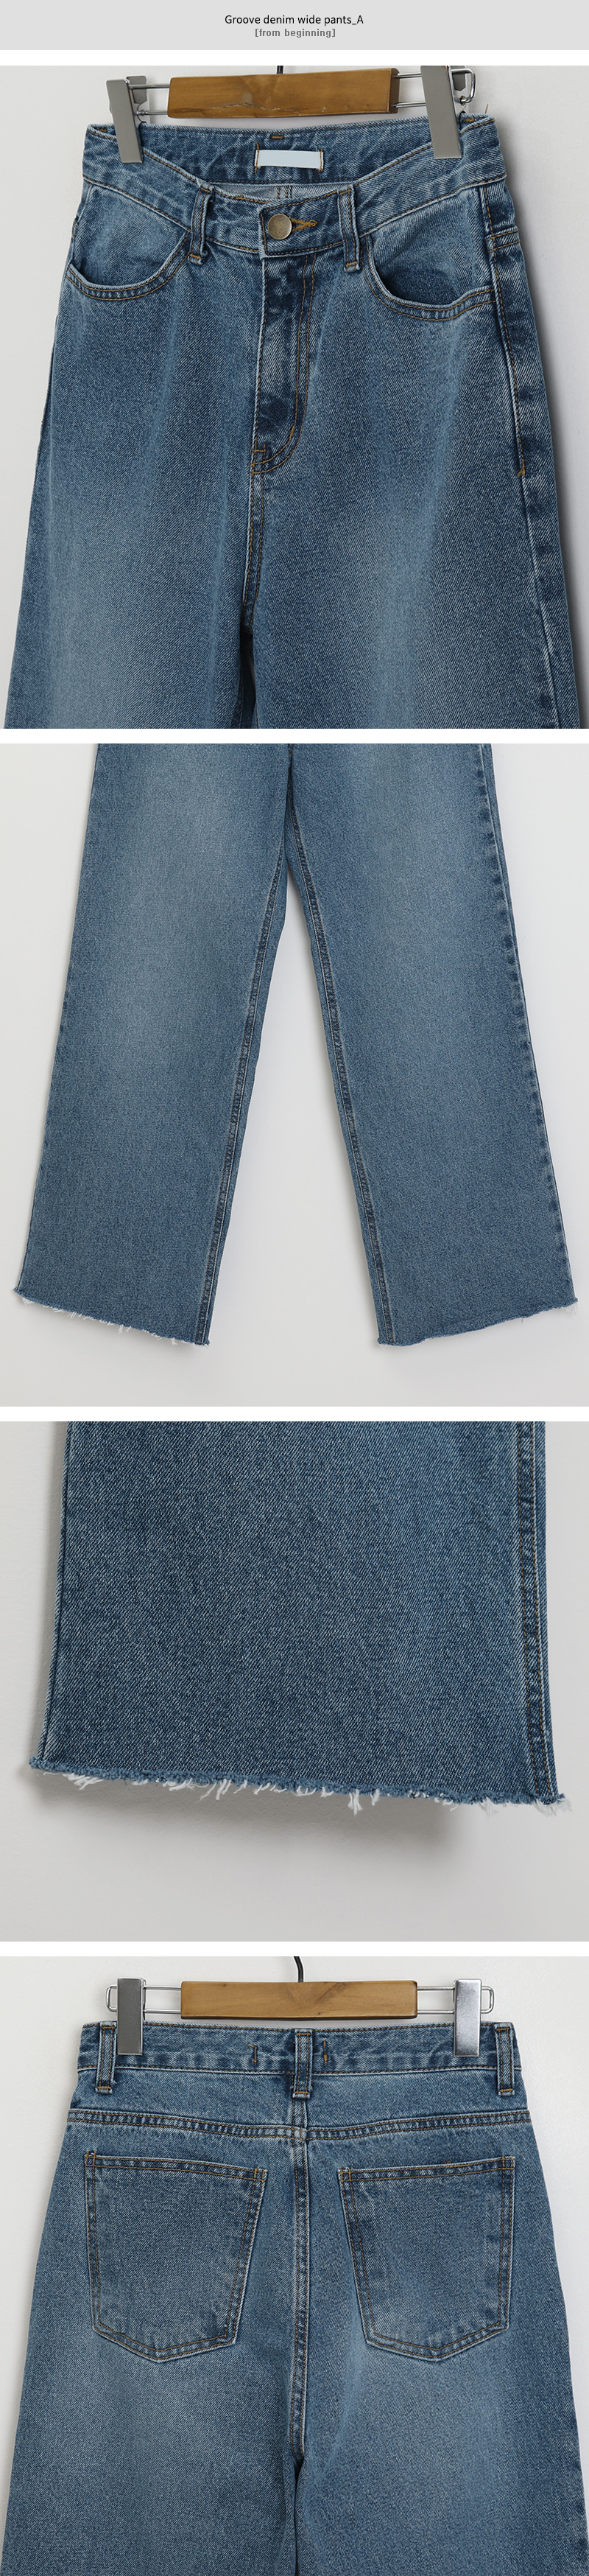 Groove denim wide pants_A